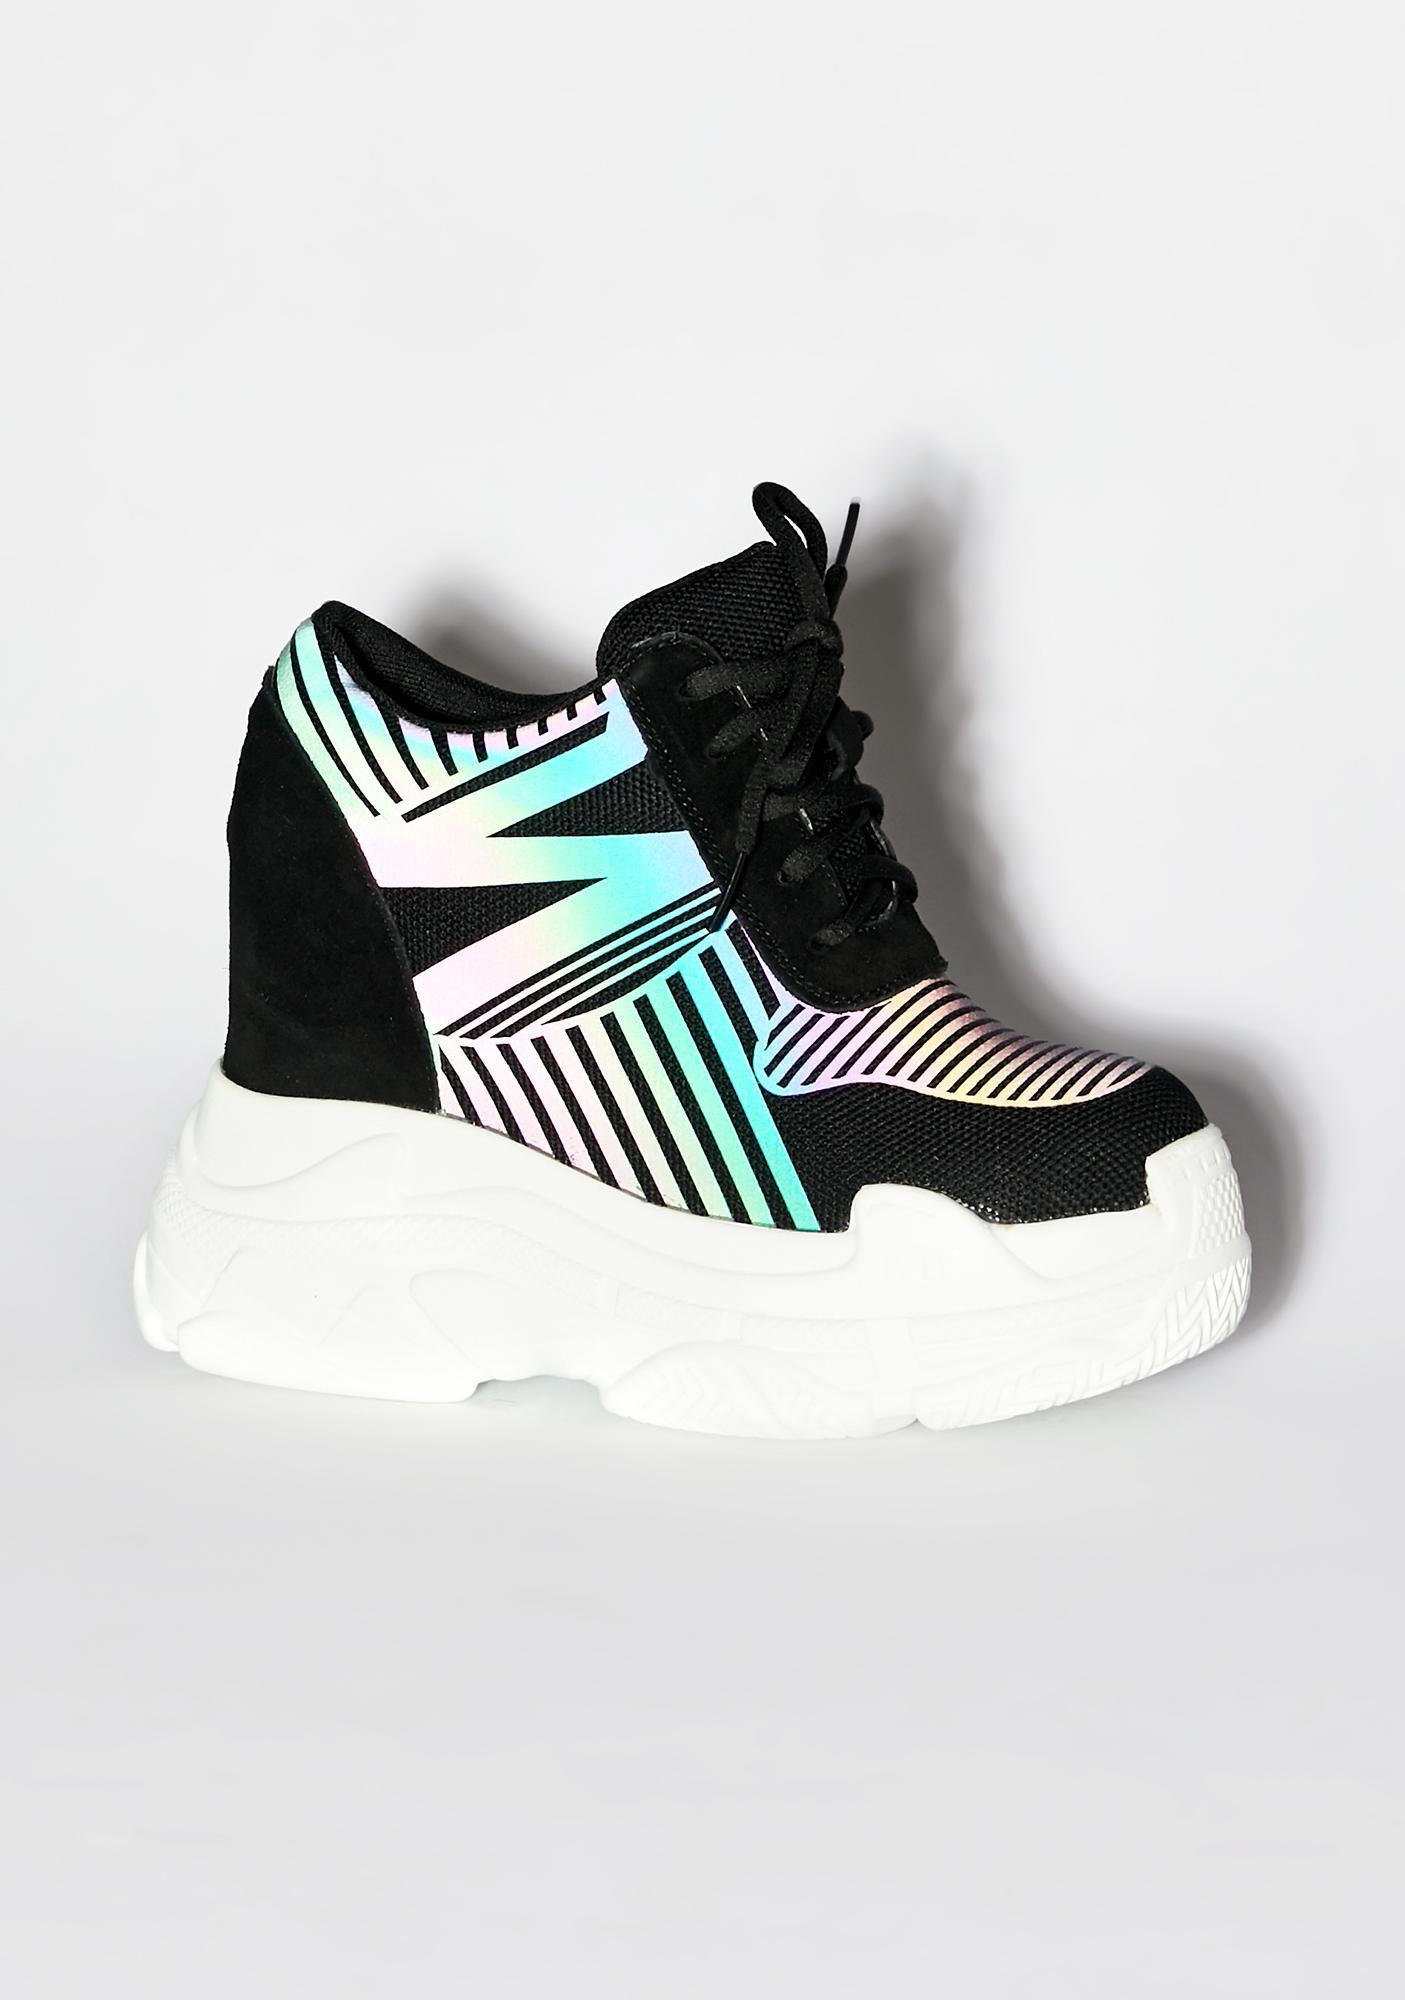 Anthony Wang Dark Essential Sidekick Reflective Sneakers